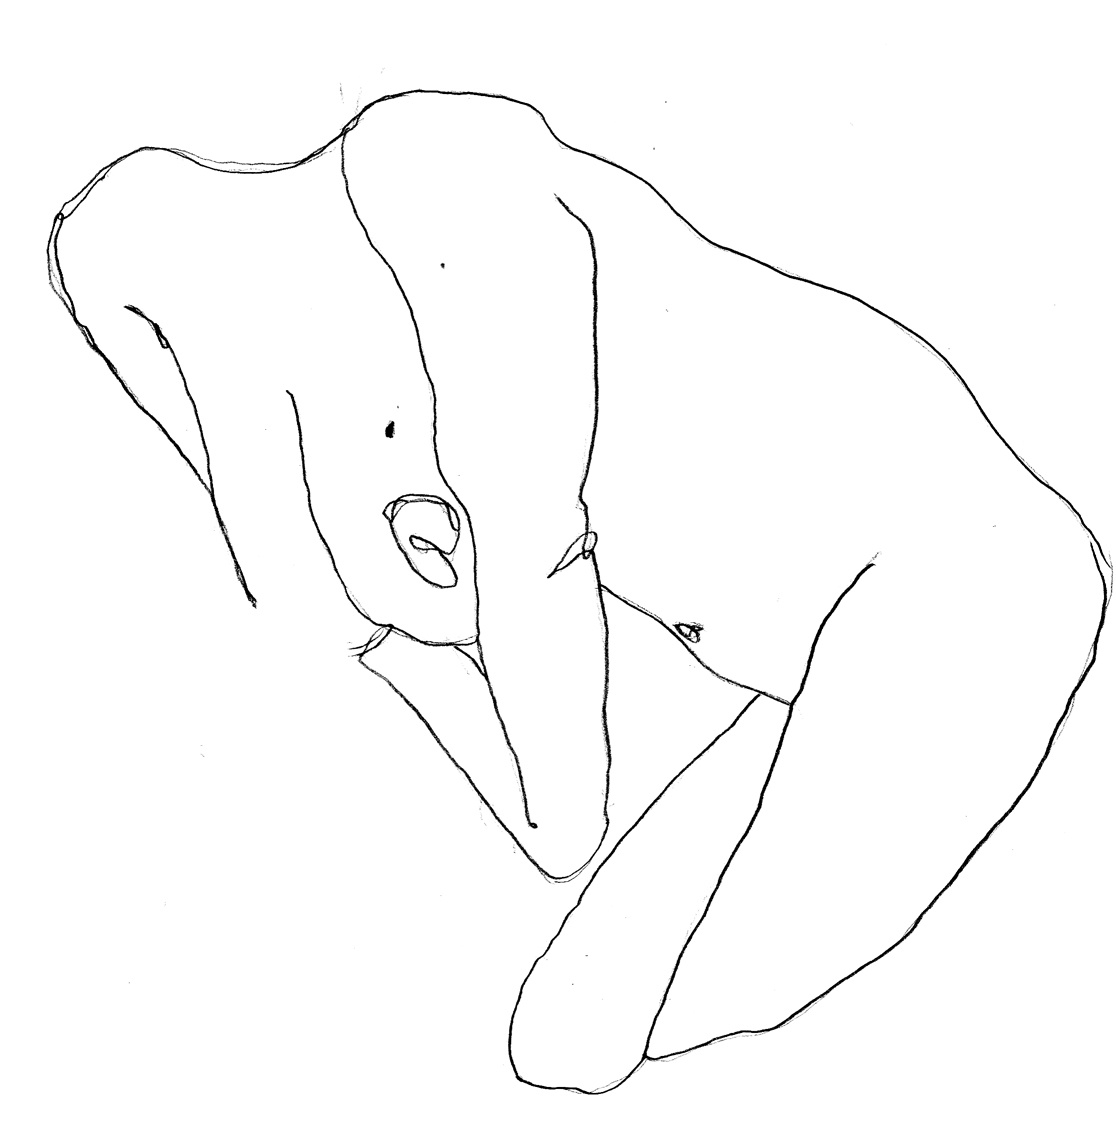 Gabriela-Sanchez-Drawing29.jpg